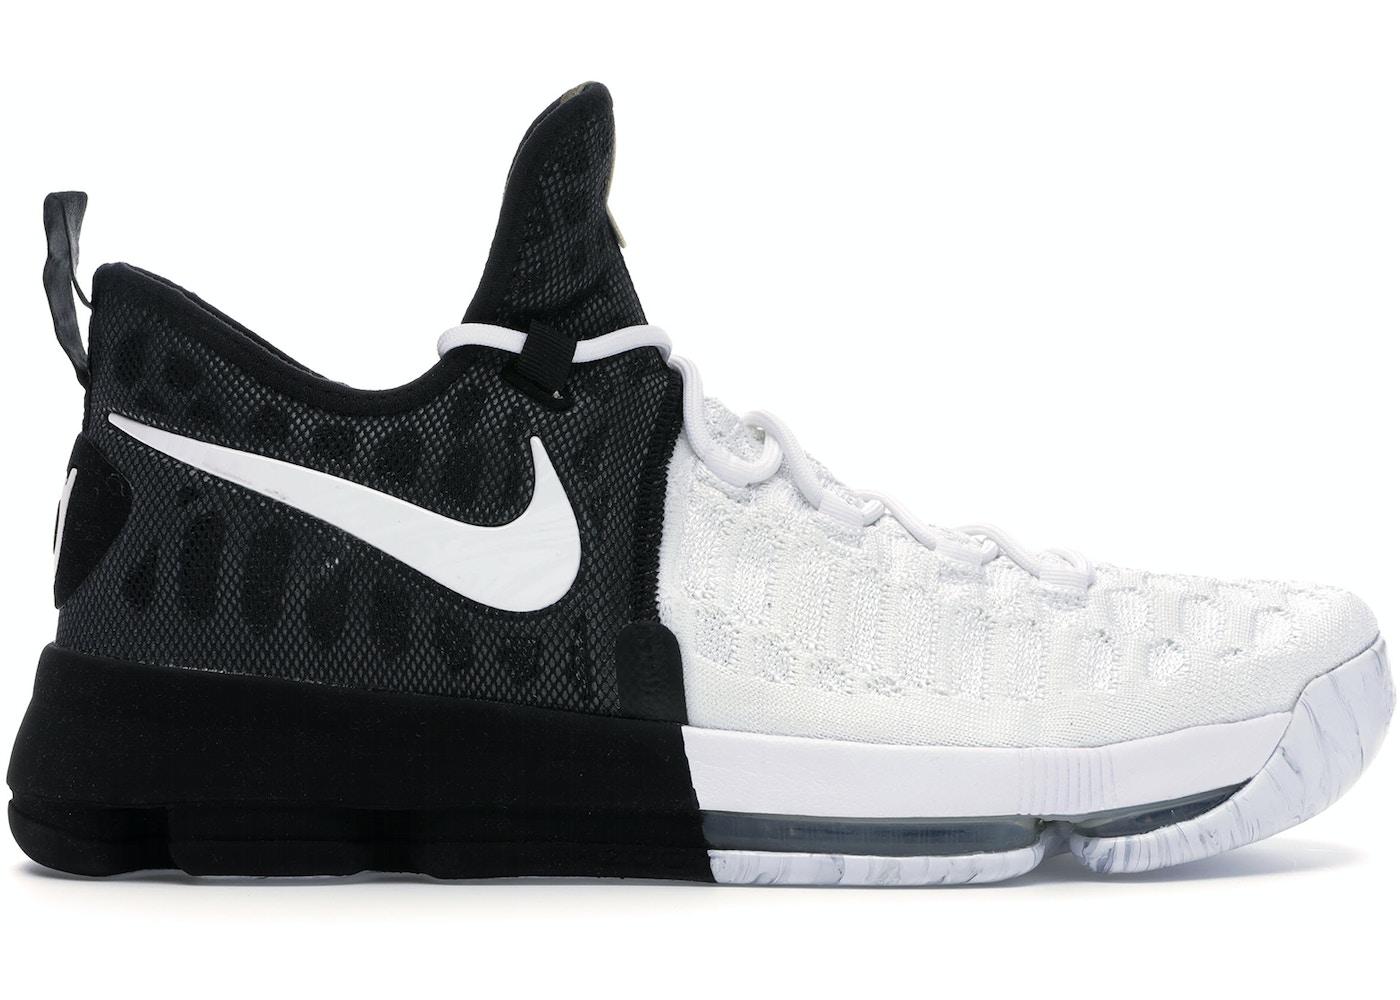 Visión general Diacrítico Bolsa  Buy Nike KD 9 Shoes & Deadstock Sneakers